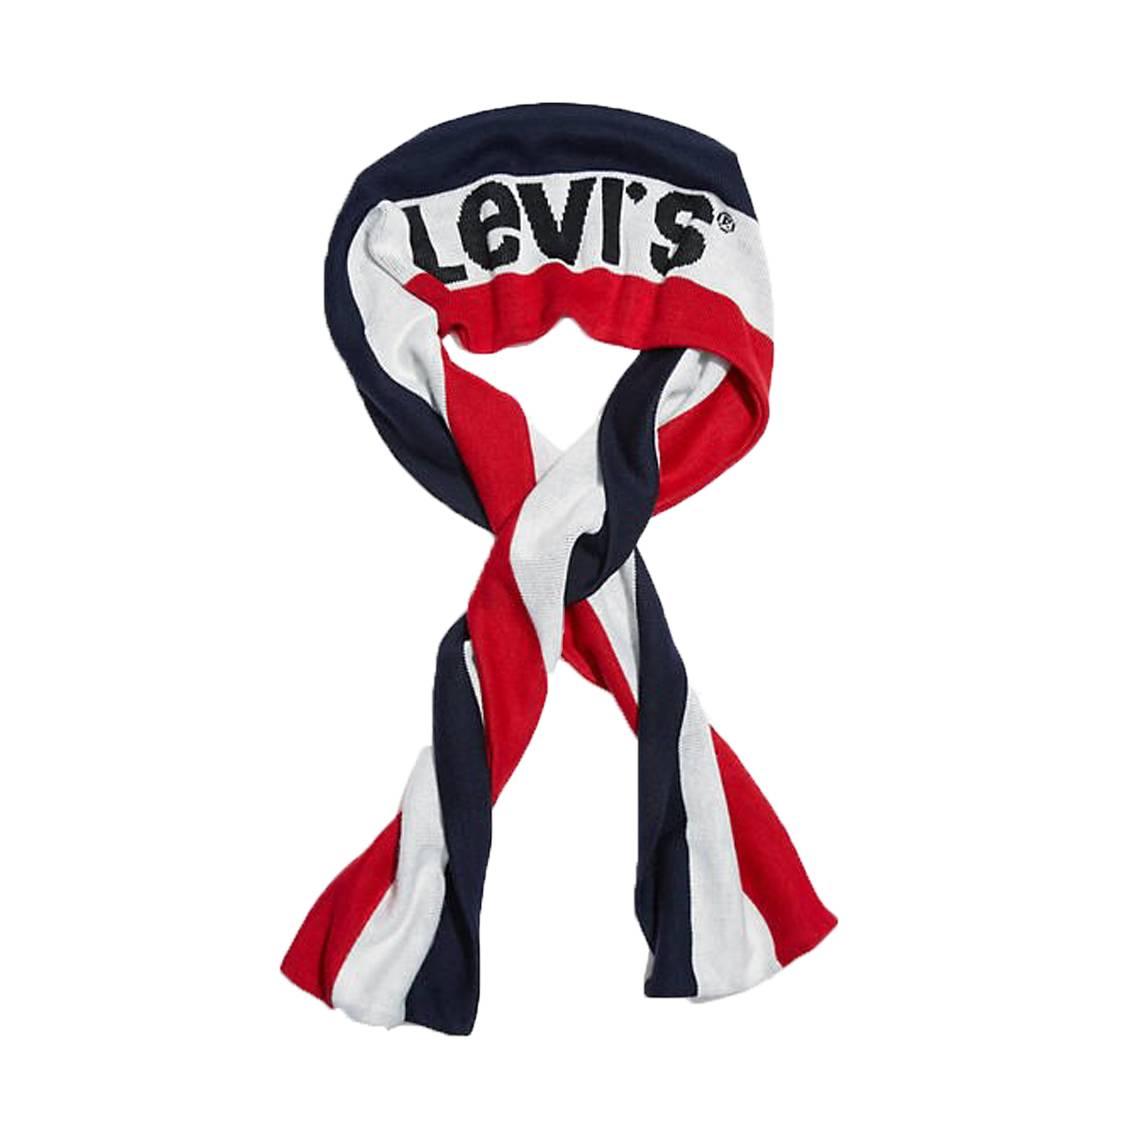 Echarpe levi\'s sportswear logo à rayures bleu marine, blanche et rouge